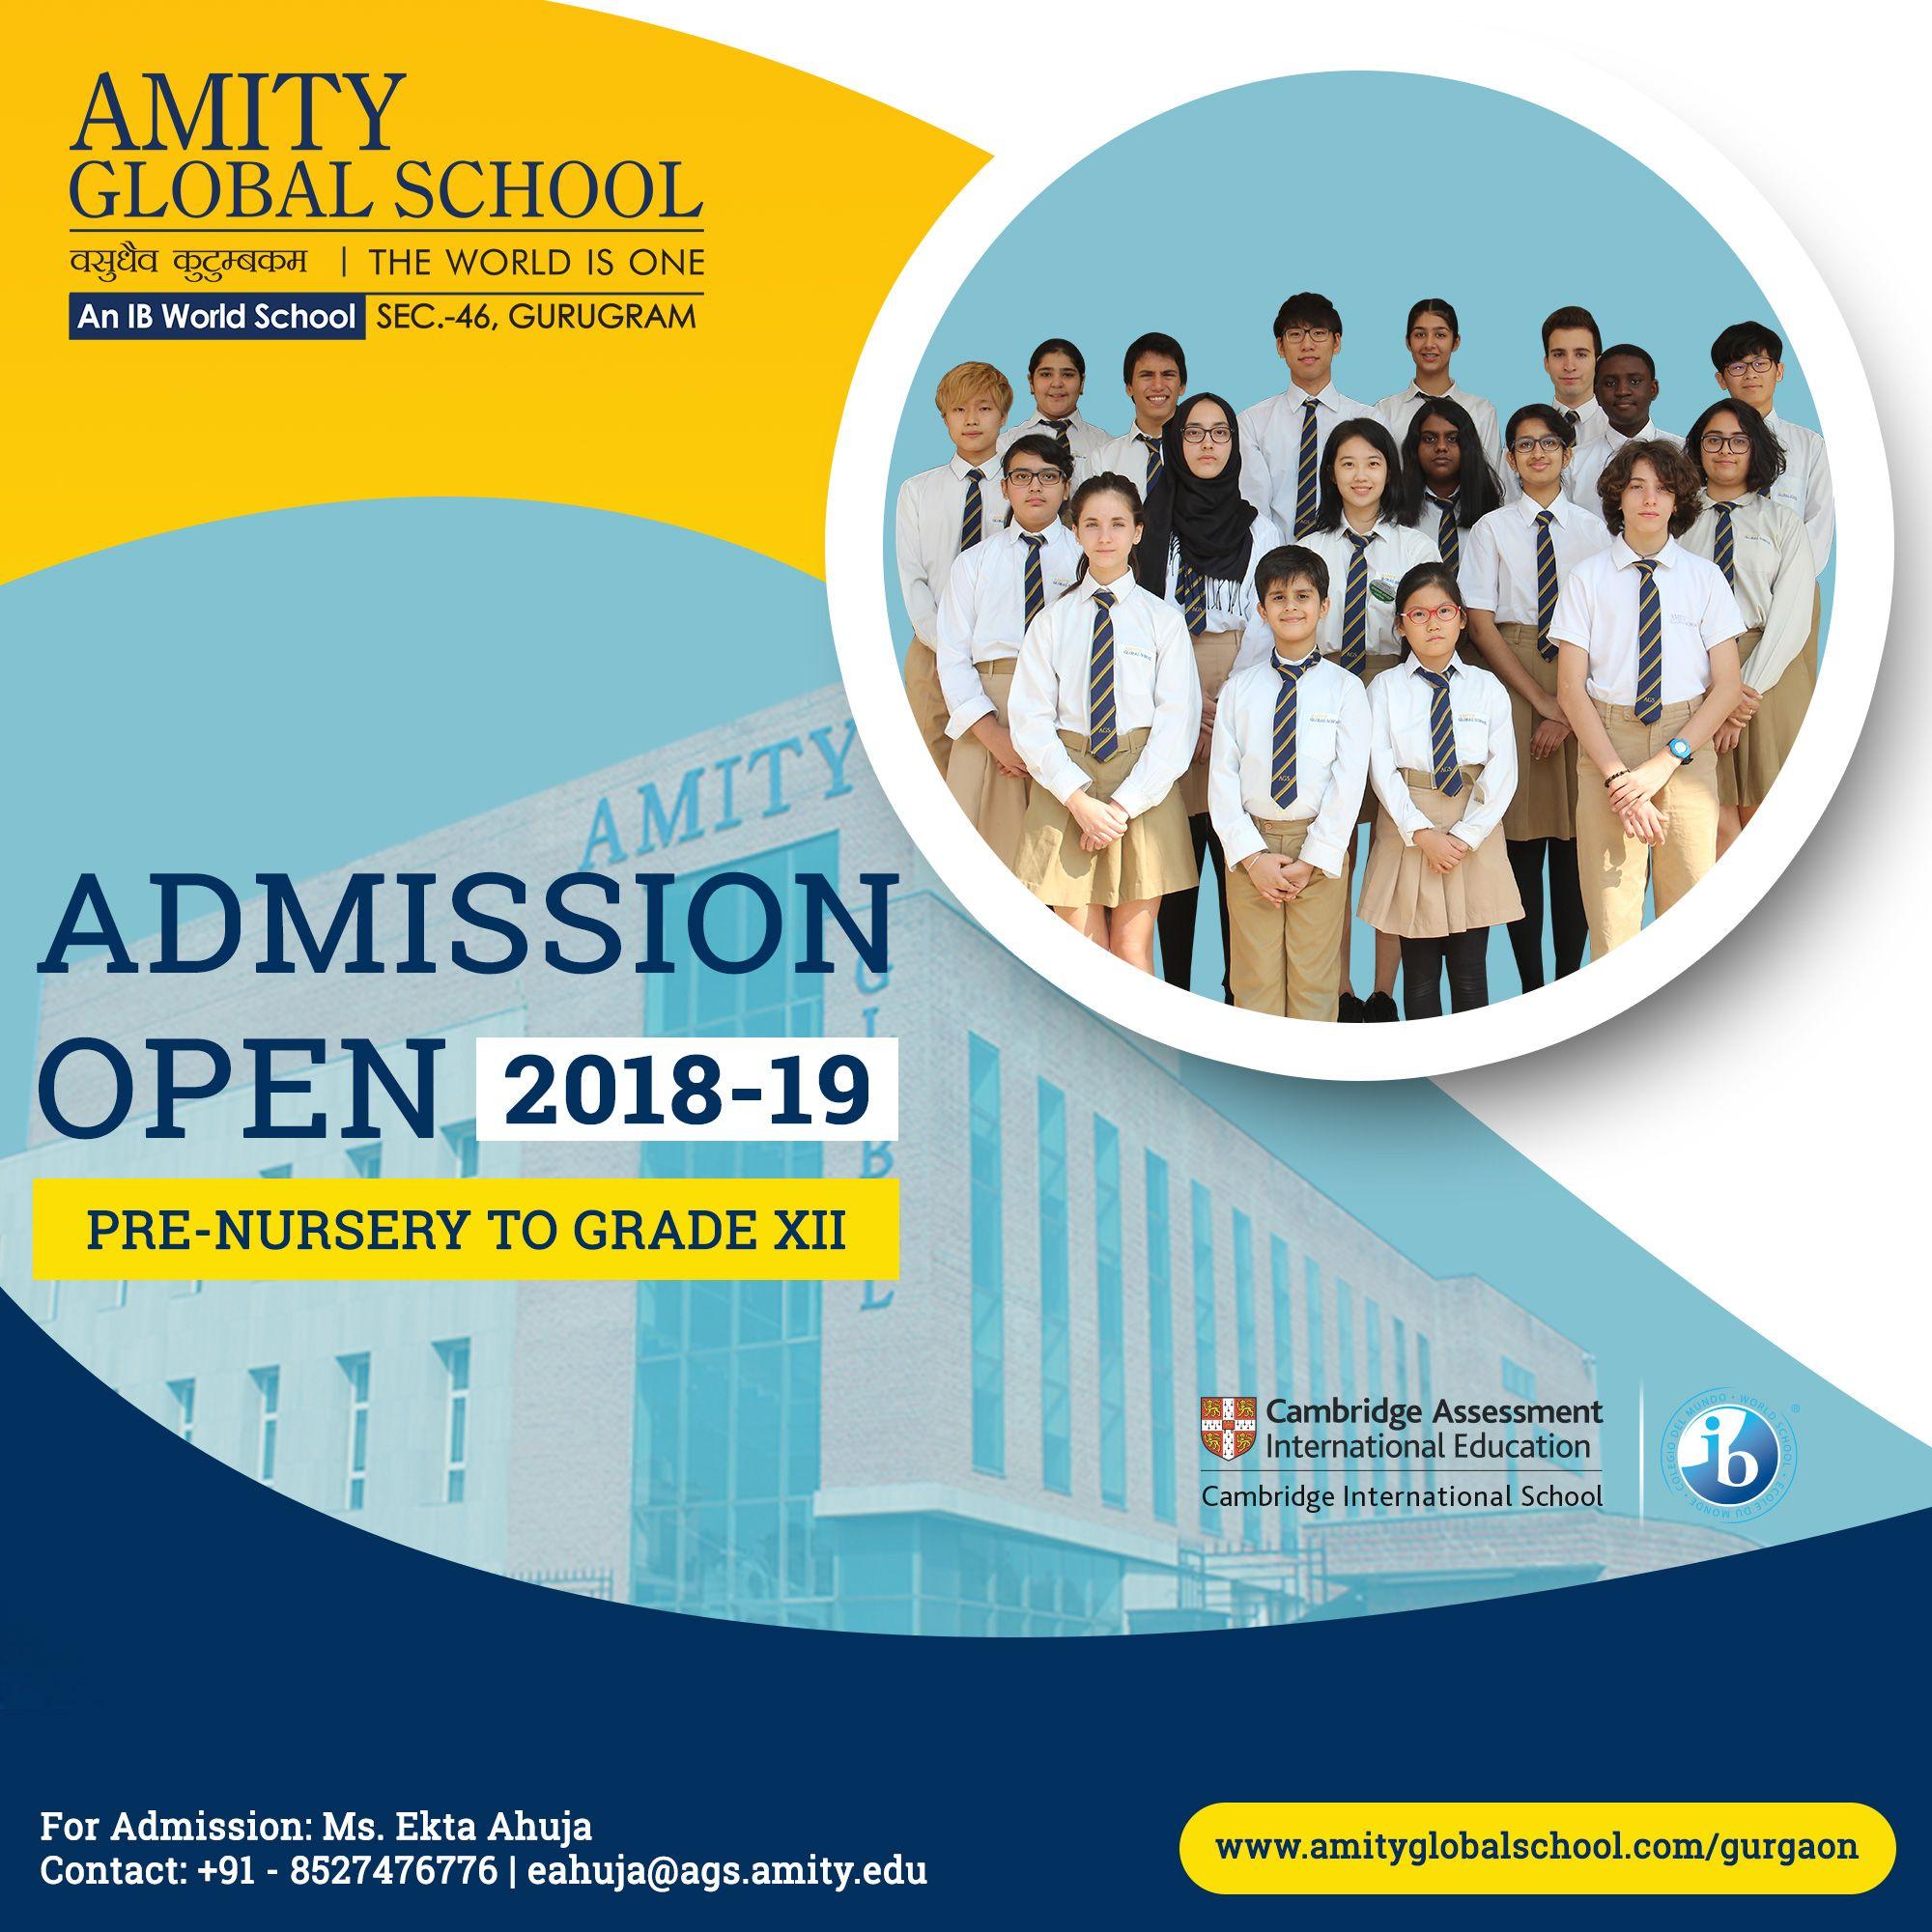 Admission Open Banner Design For School